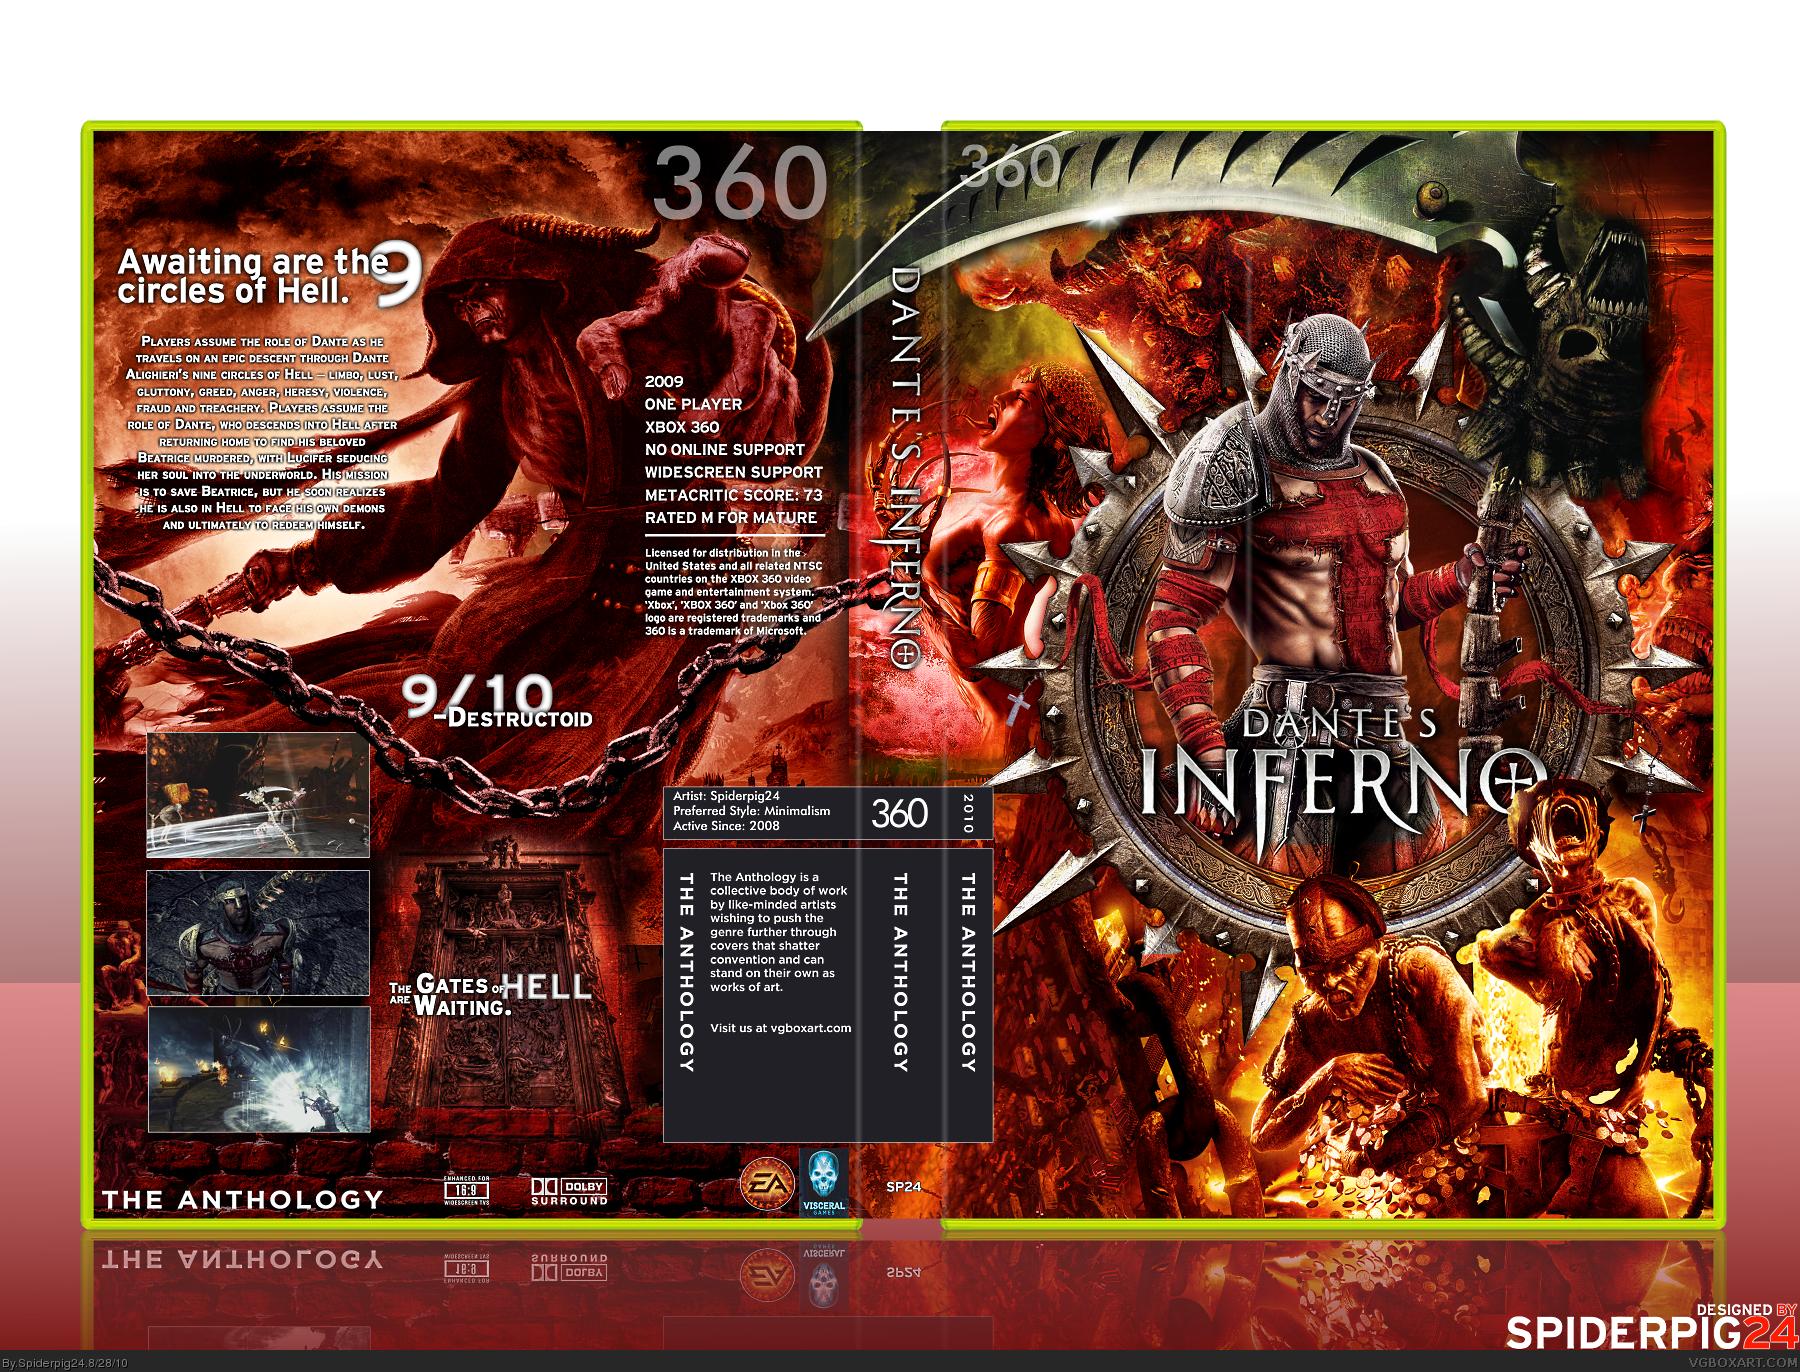 Dante\u0026#39;s Inferno Xbox 360 Box Art Cover by Spiderpig24